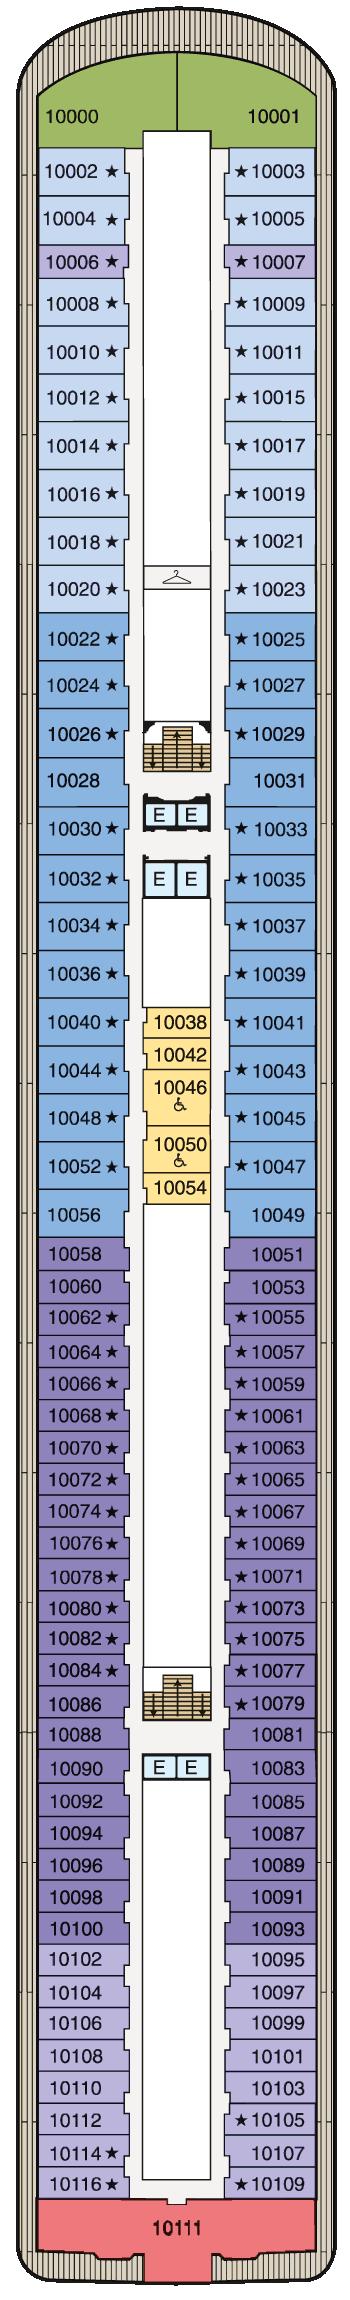 MS Marina - Deck 10